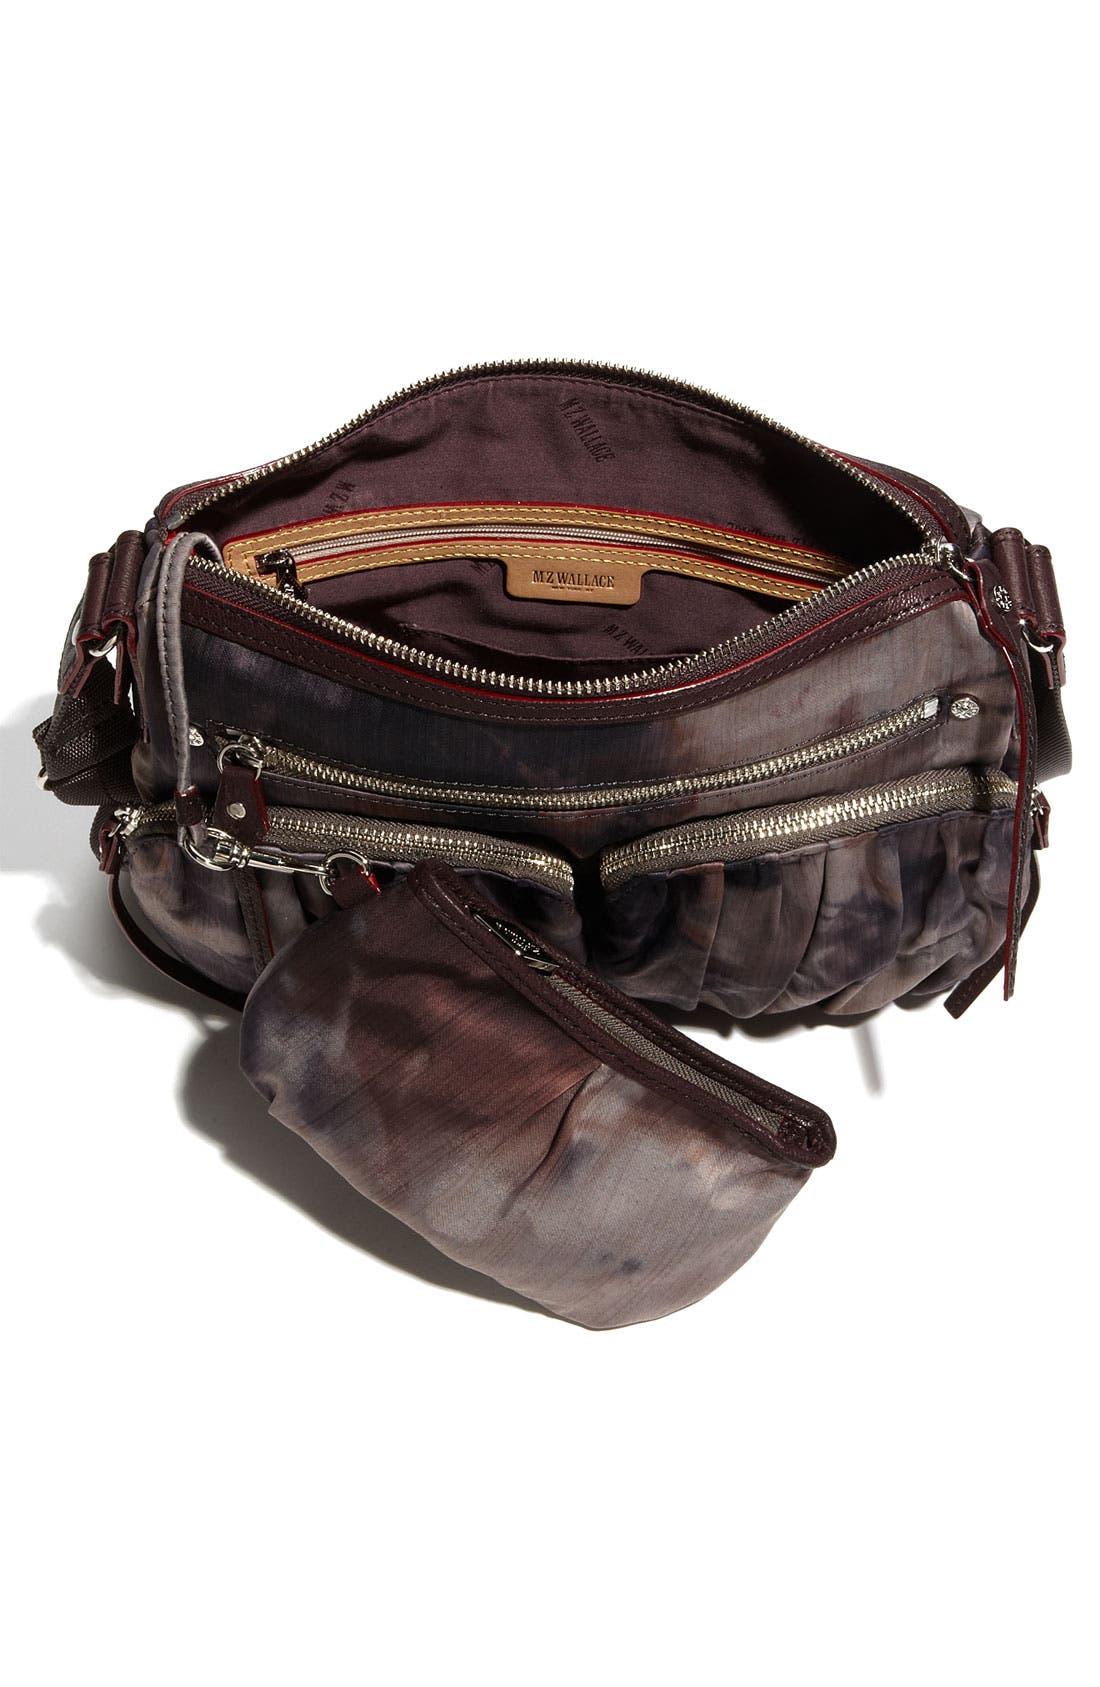 'Paige - Night Storm' Crossbody Bag,                             Alternate thumbnail 2, color,                             500